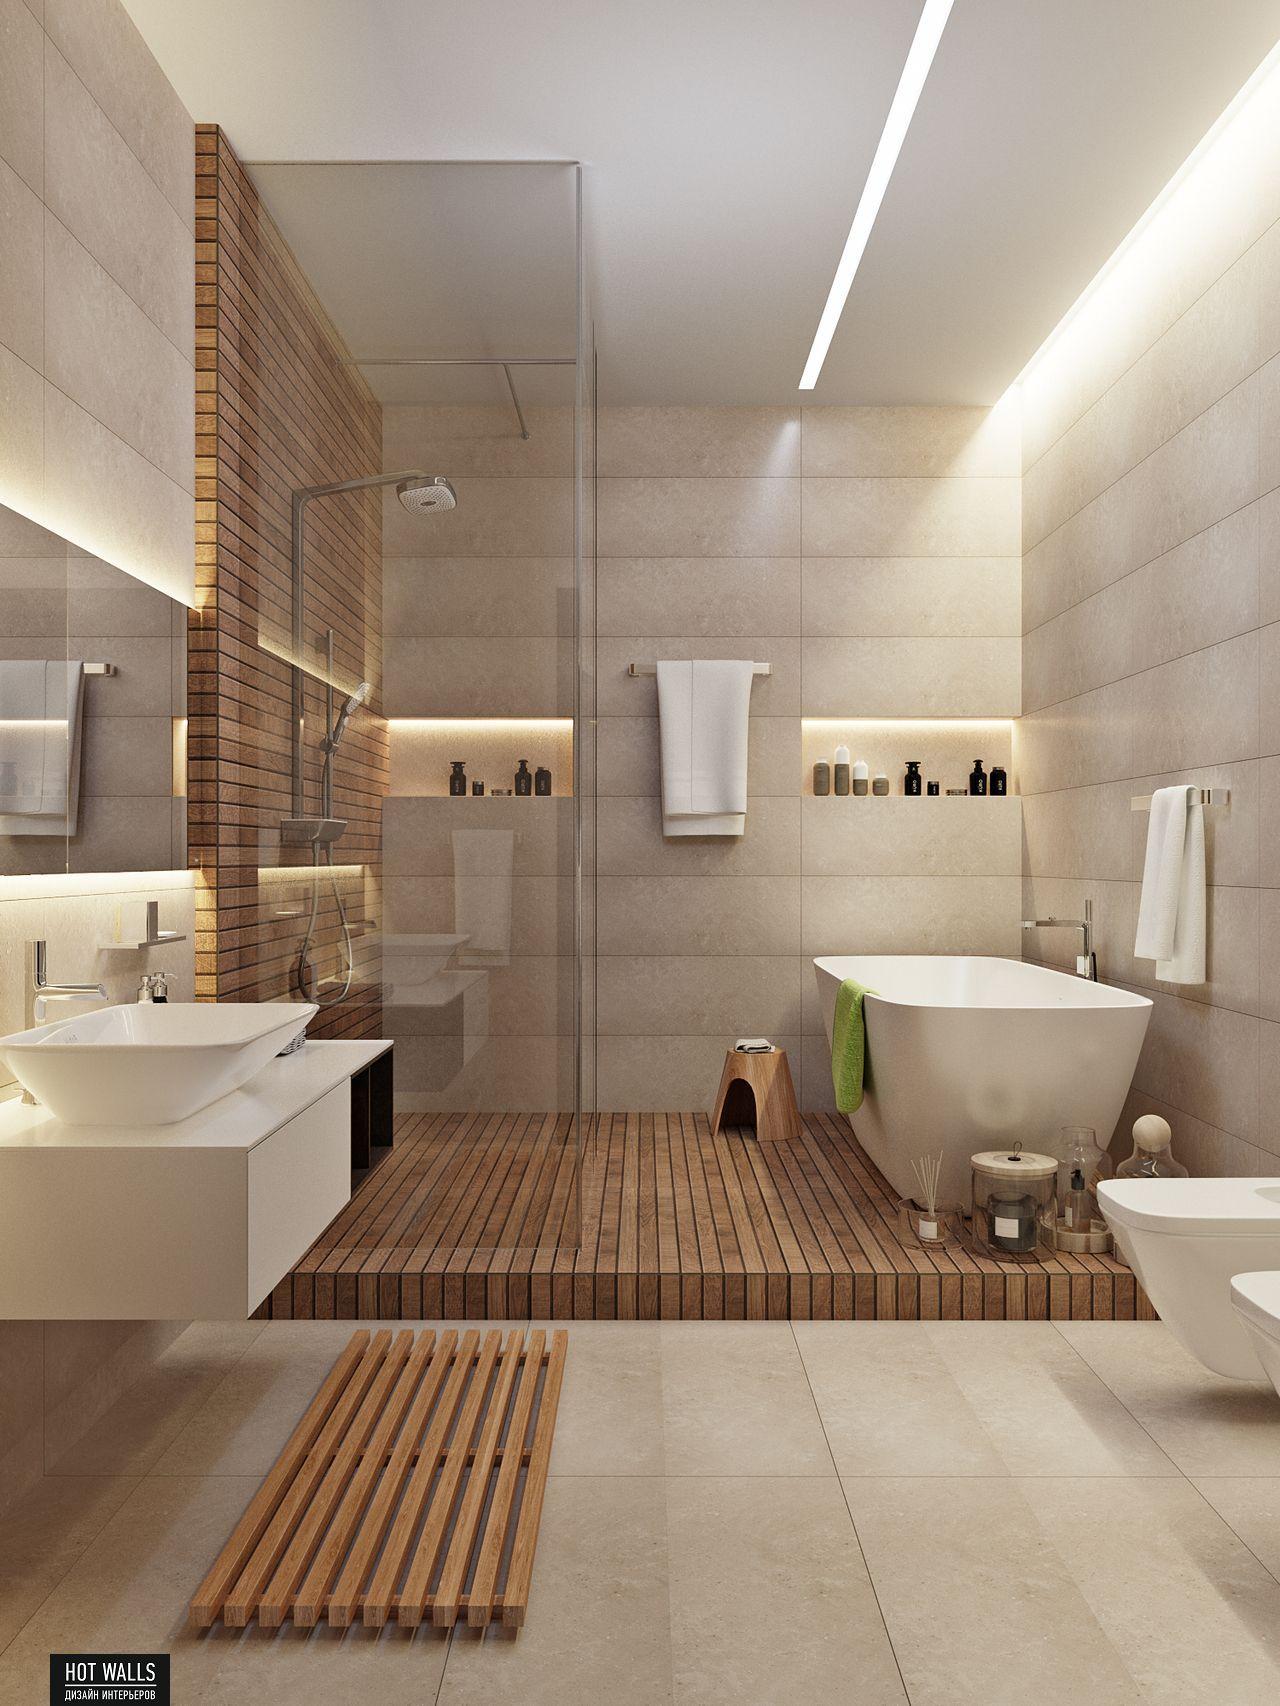 Moderne zen badezimmerideen vannaya  badezimmer ideen  pinterest  interiors bath